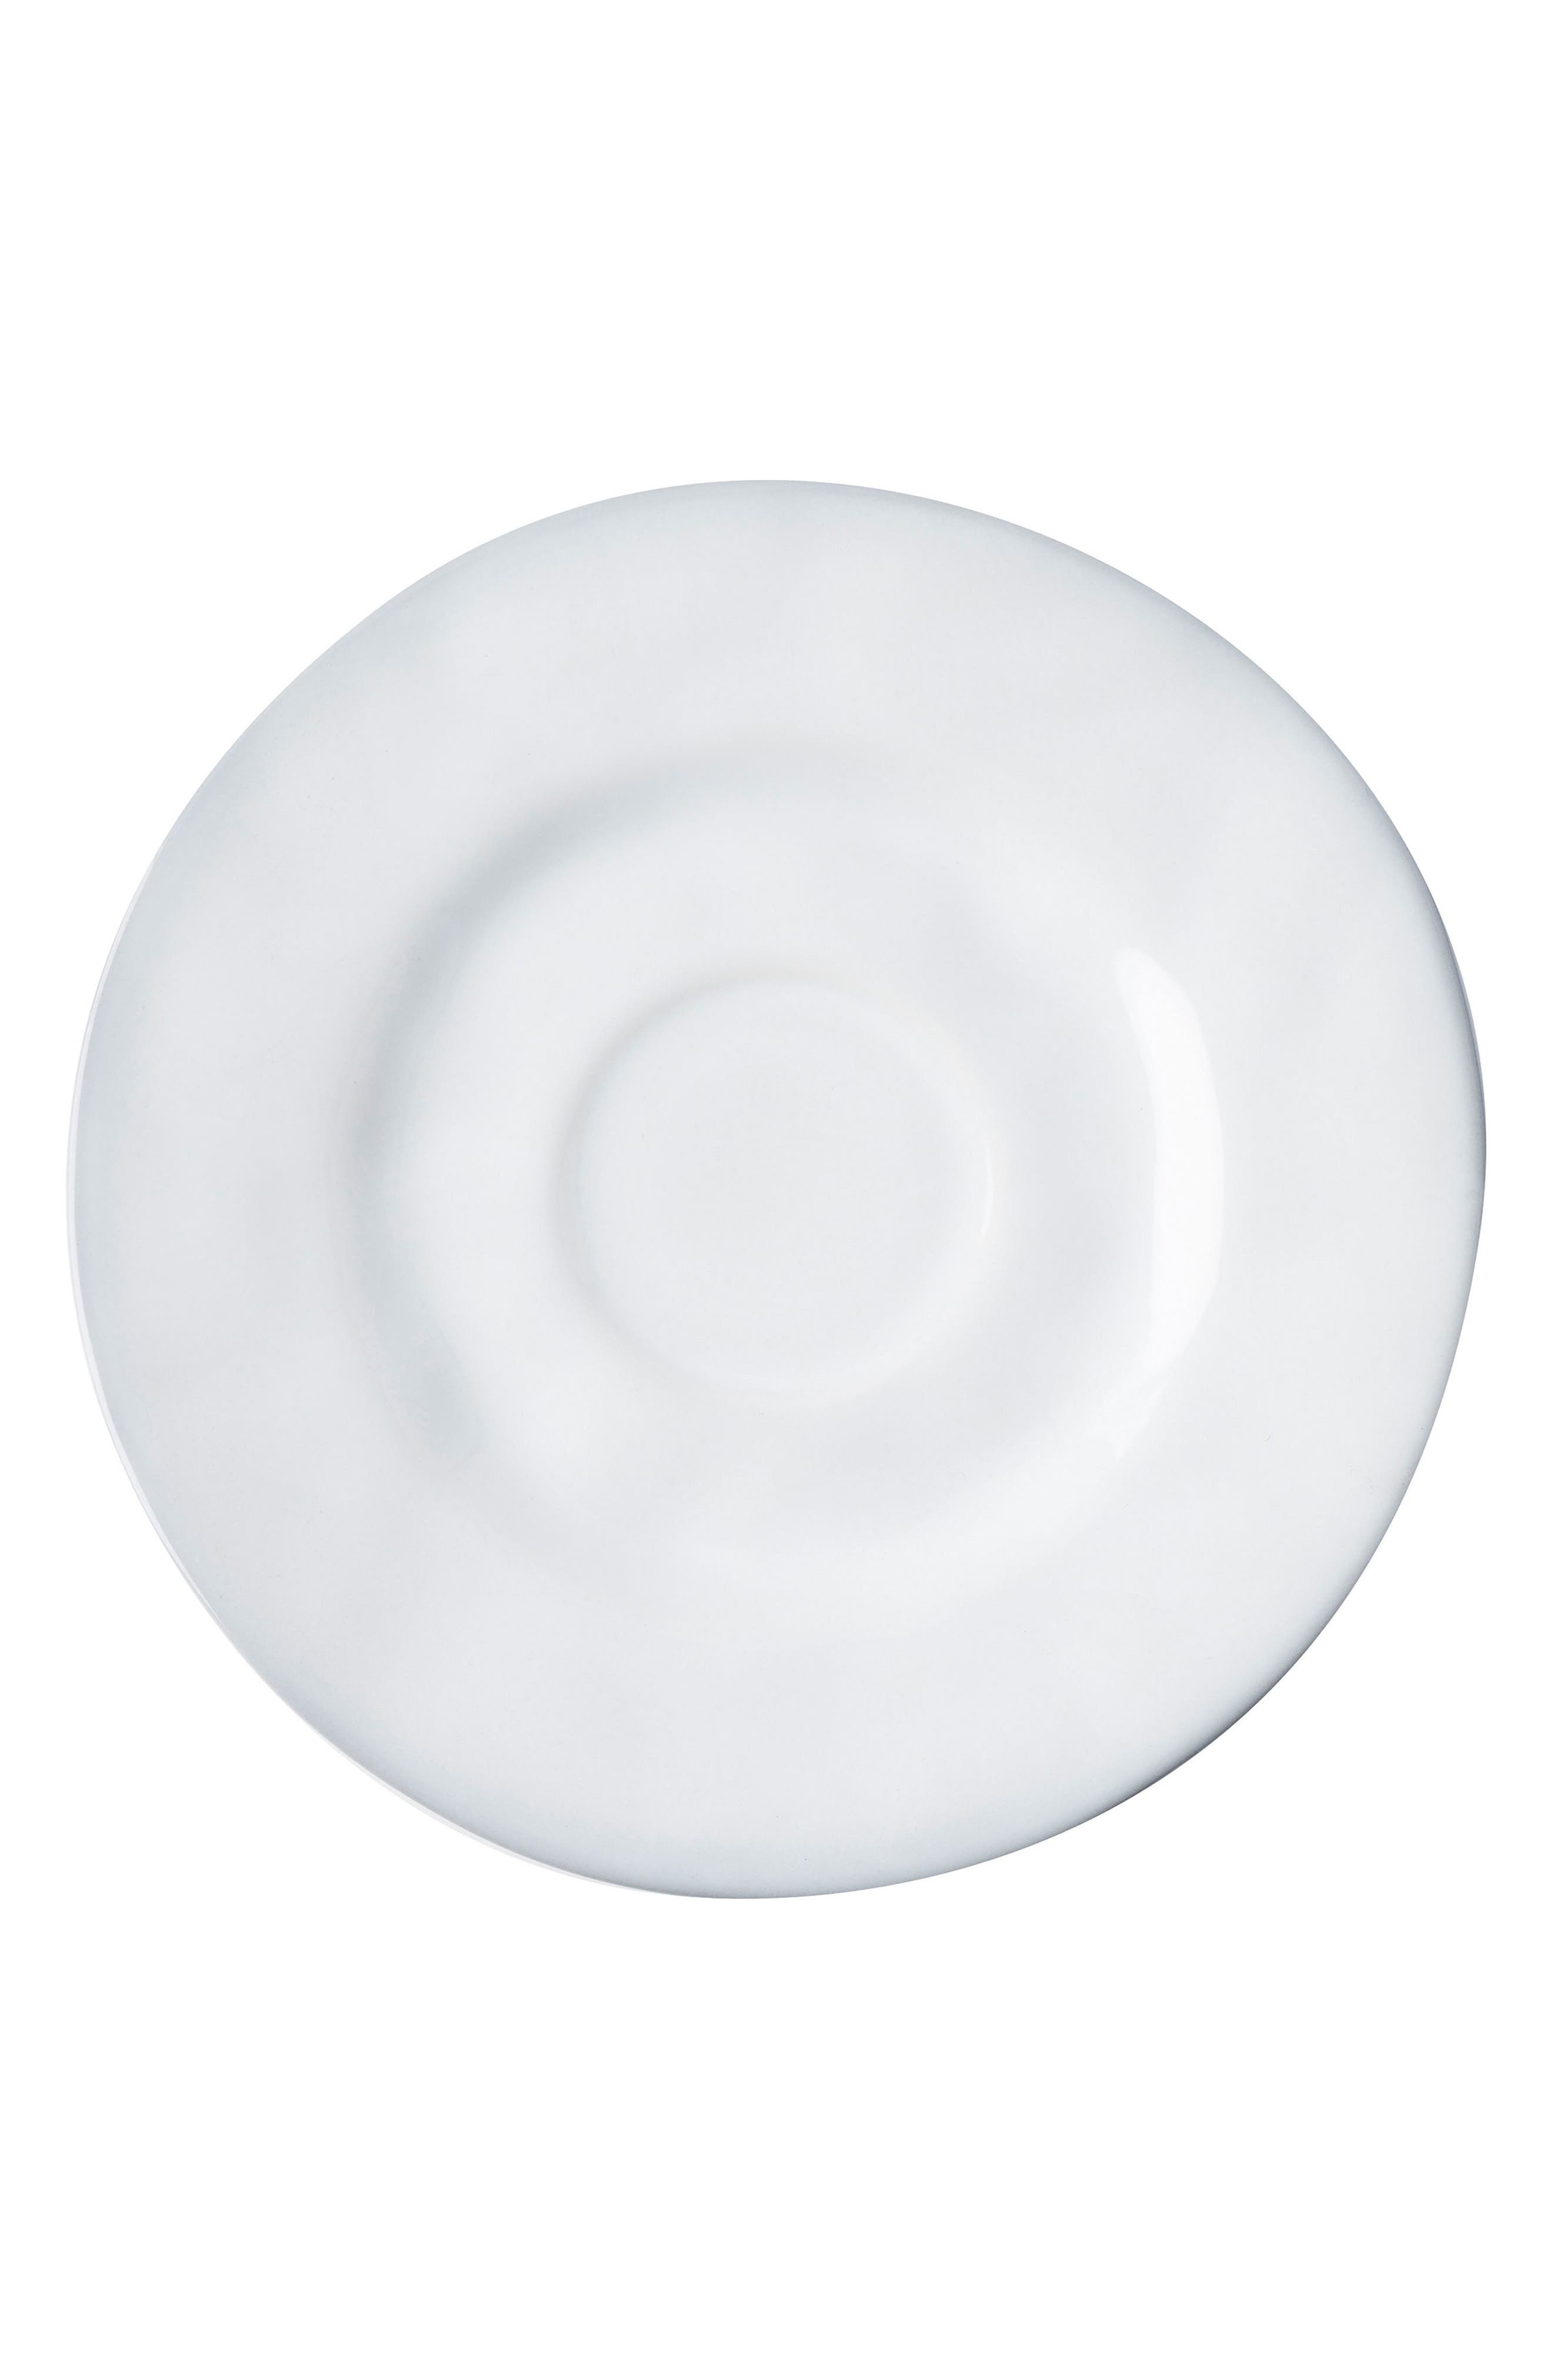 Juliska Quotidien White Truffle Ceramic Saucer